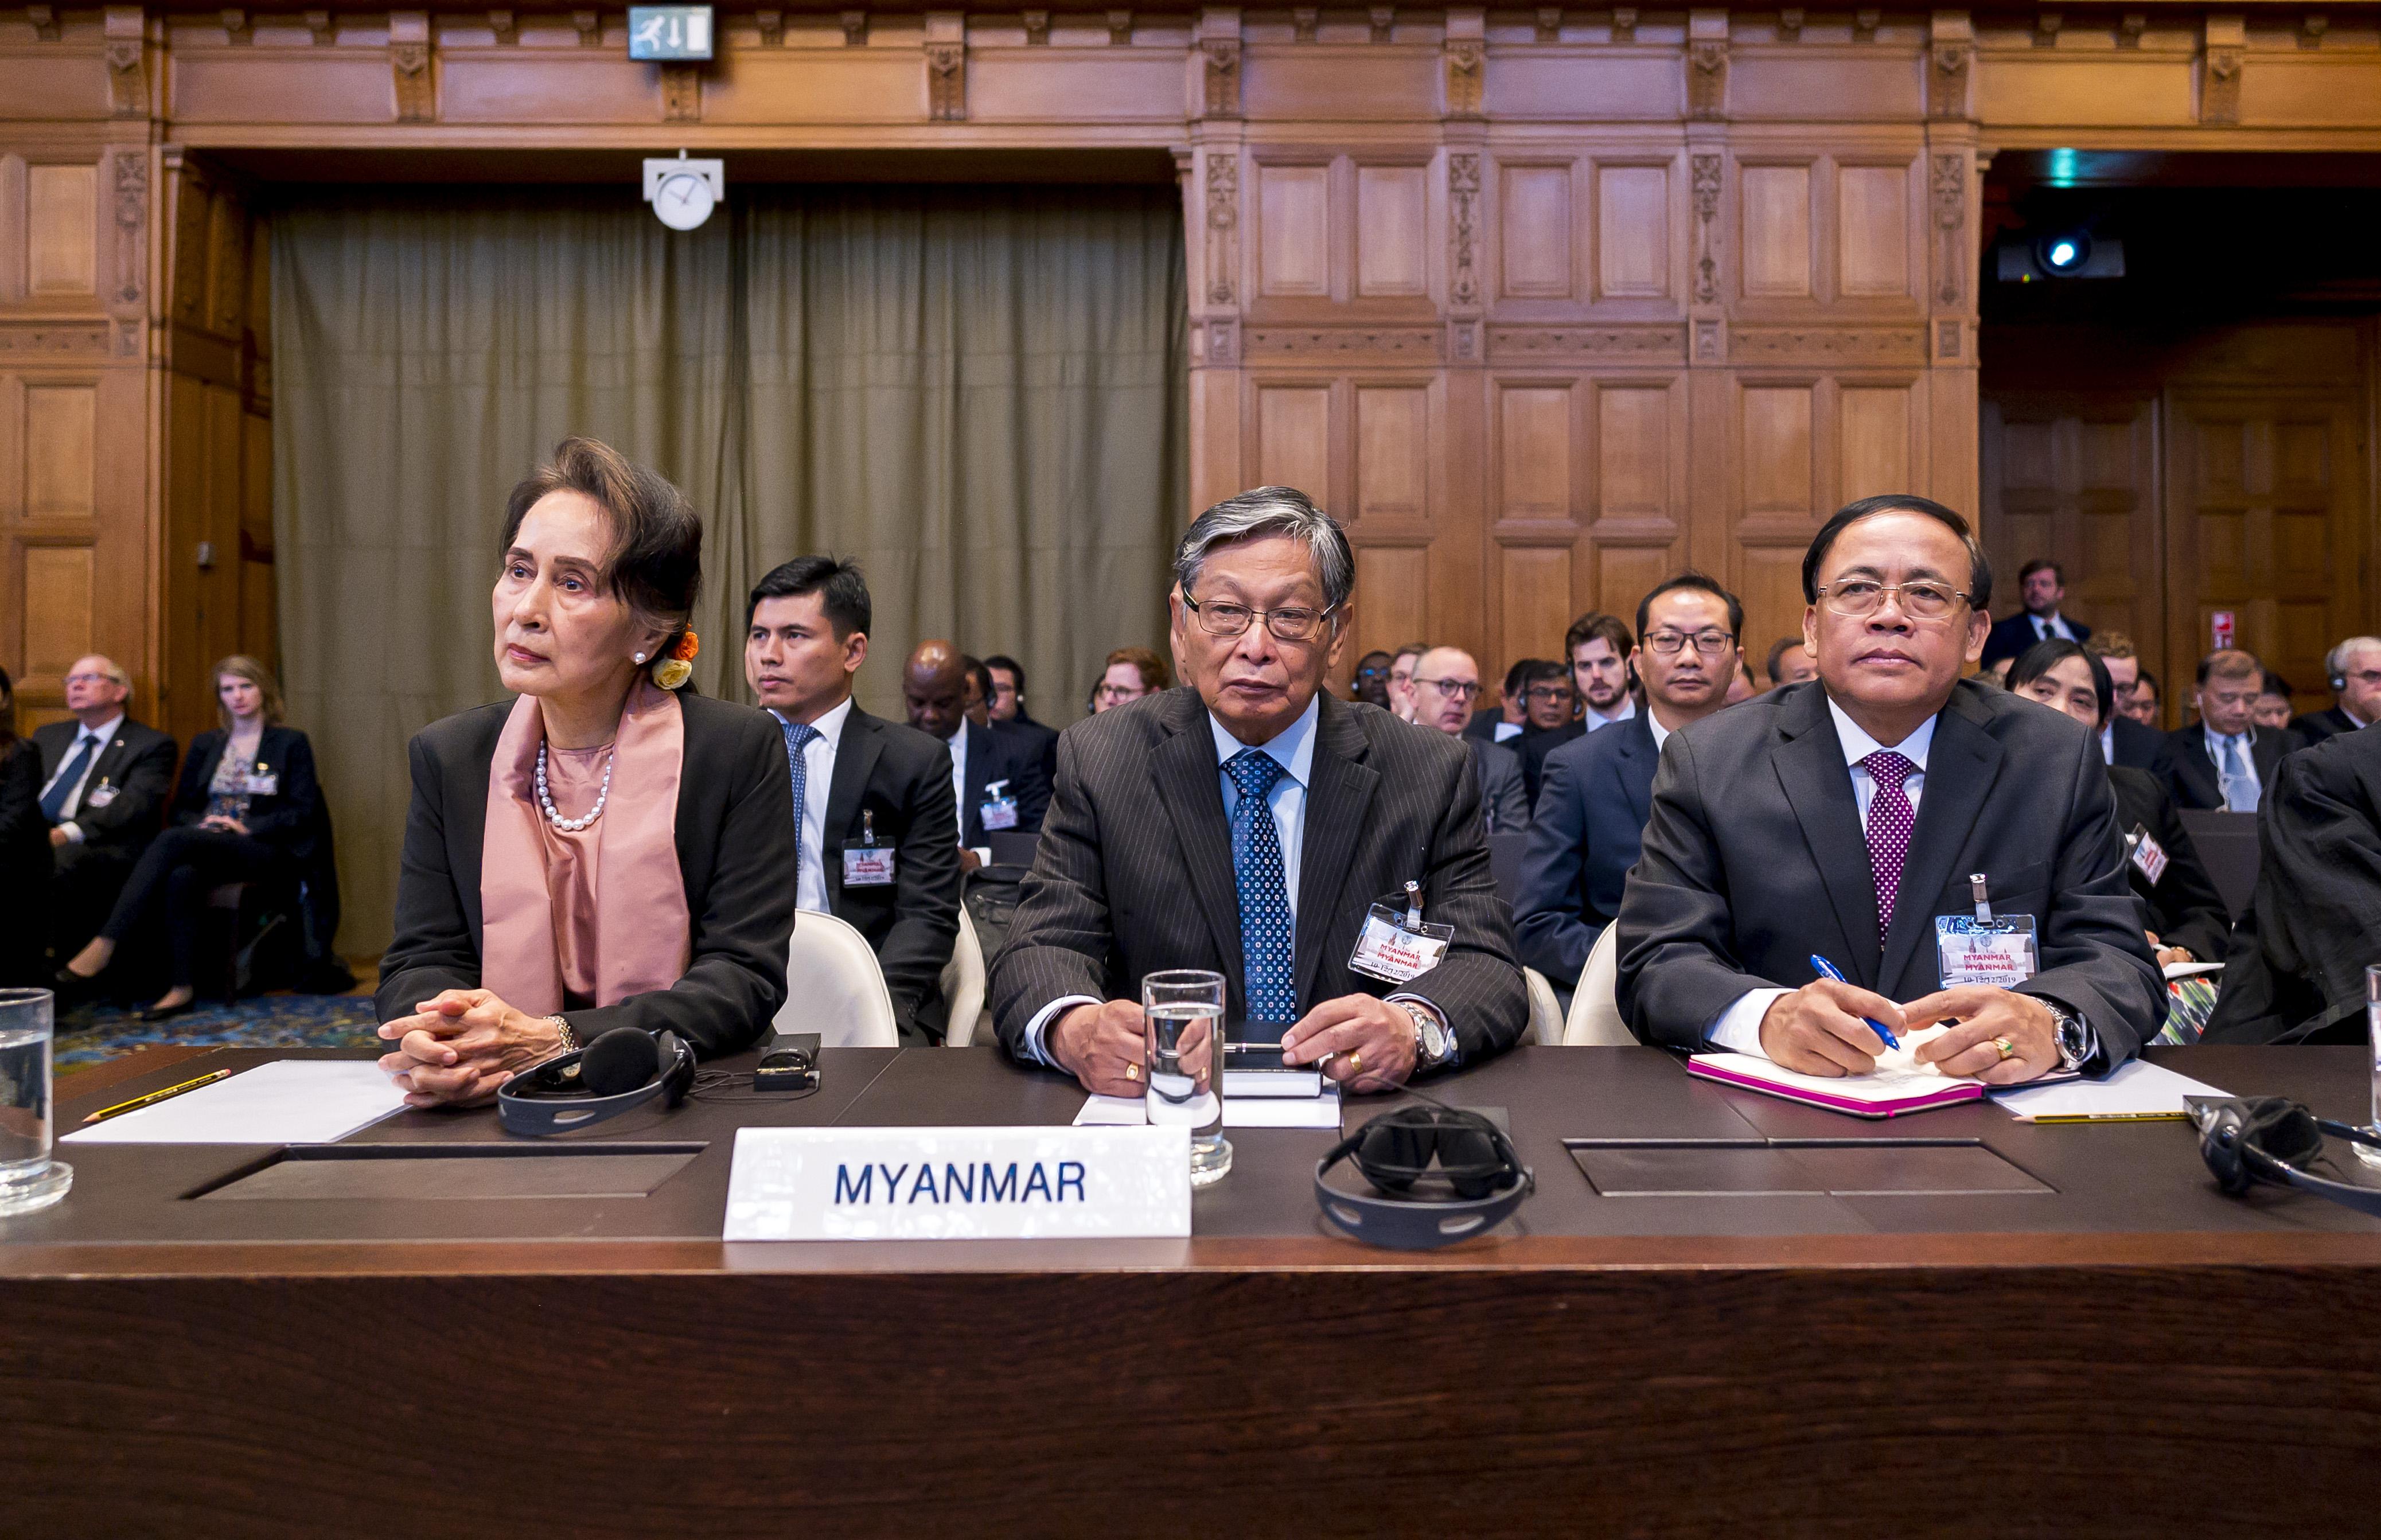 Aung San Suu Kyi at The Hague